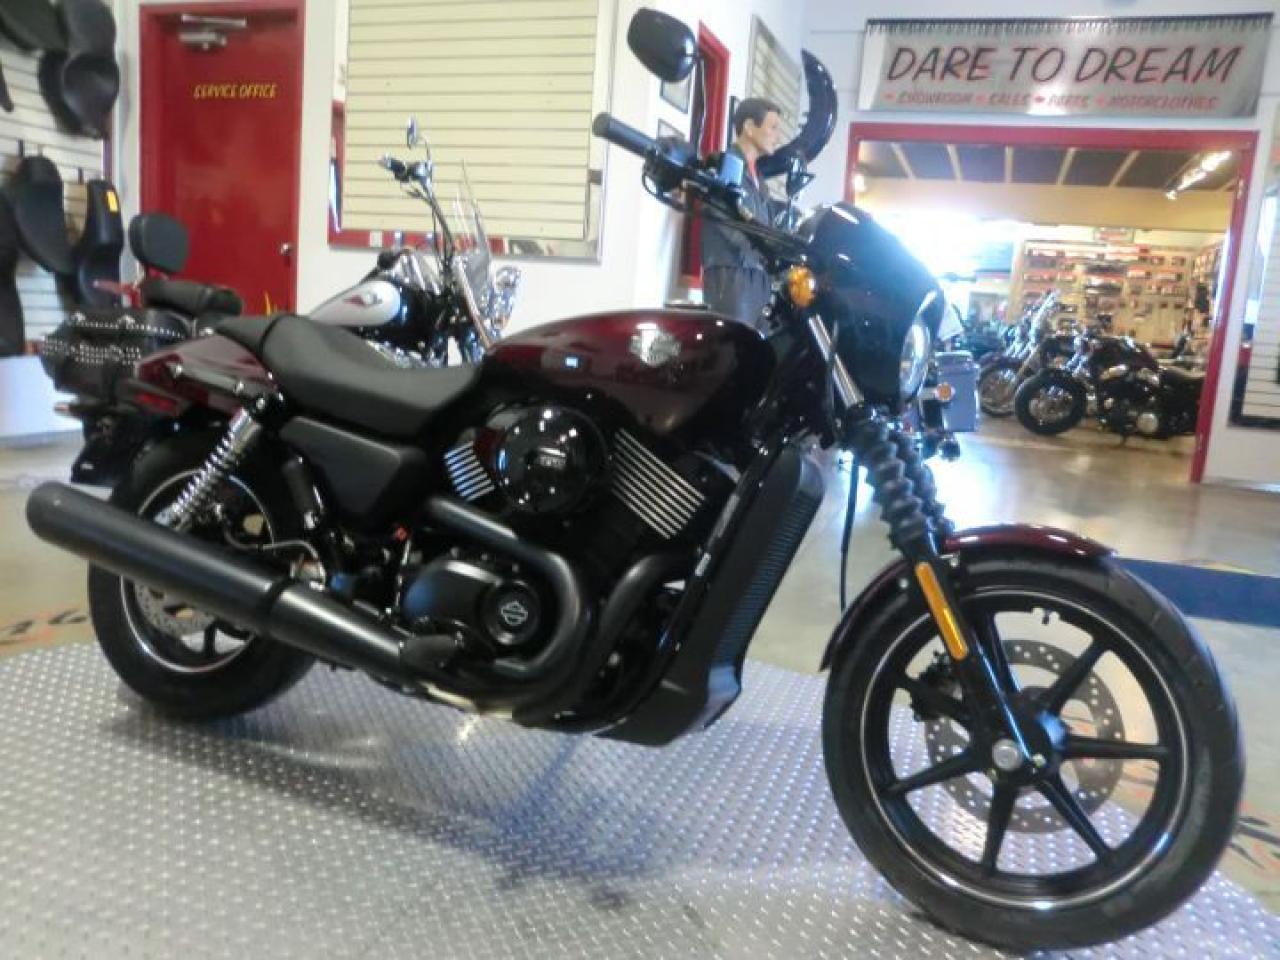 2015 Harley-Davidson Street 750 XG 750 STREET